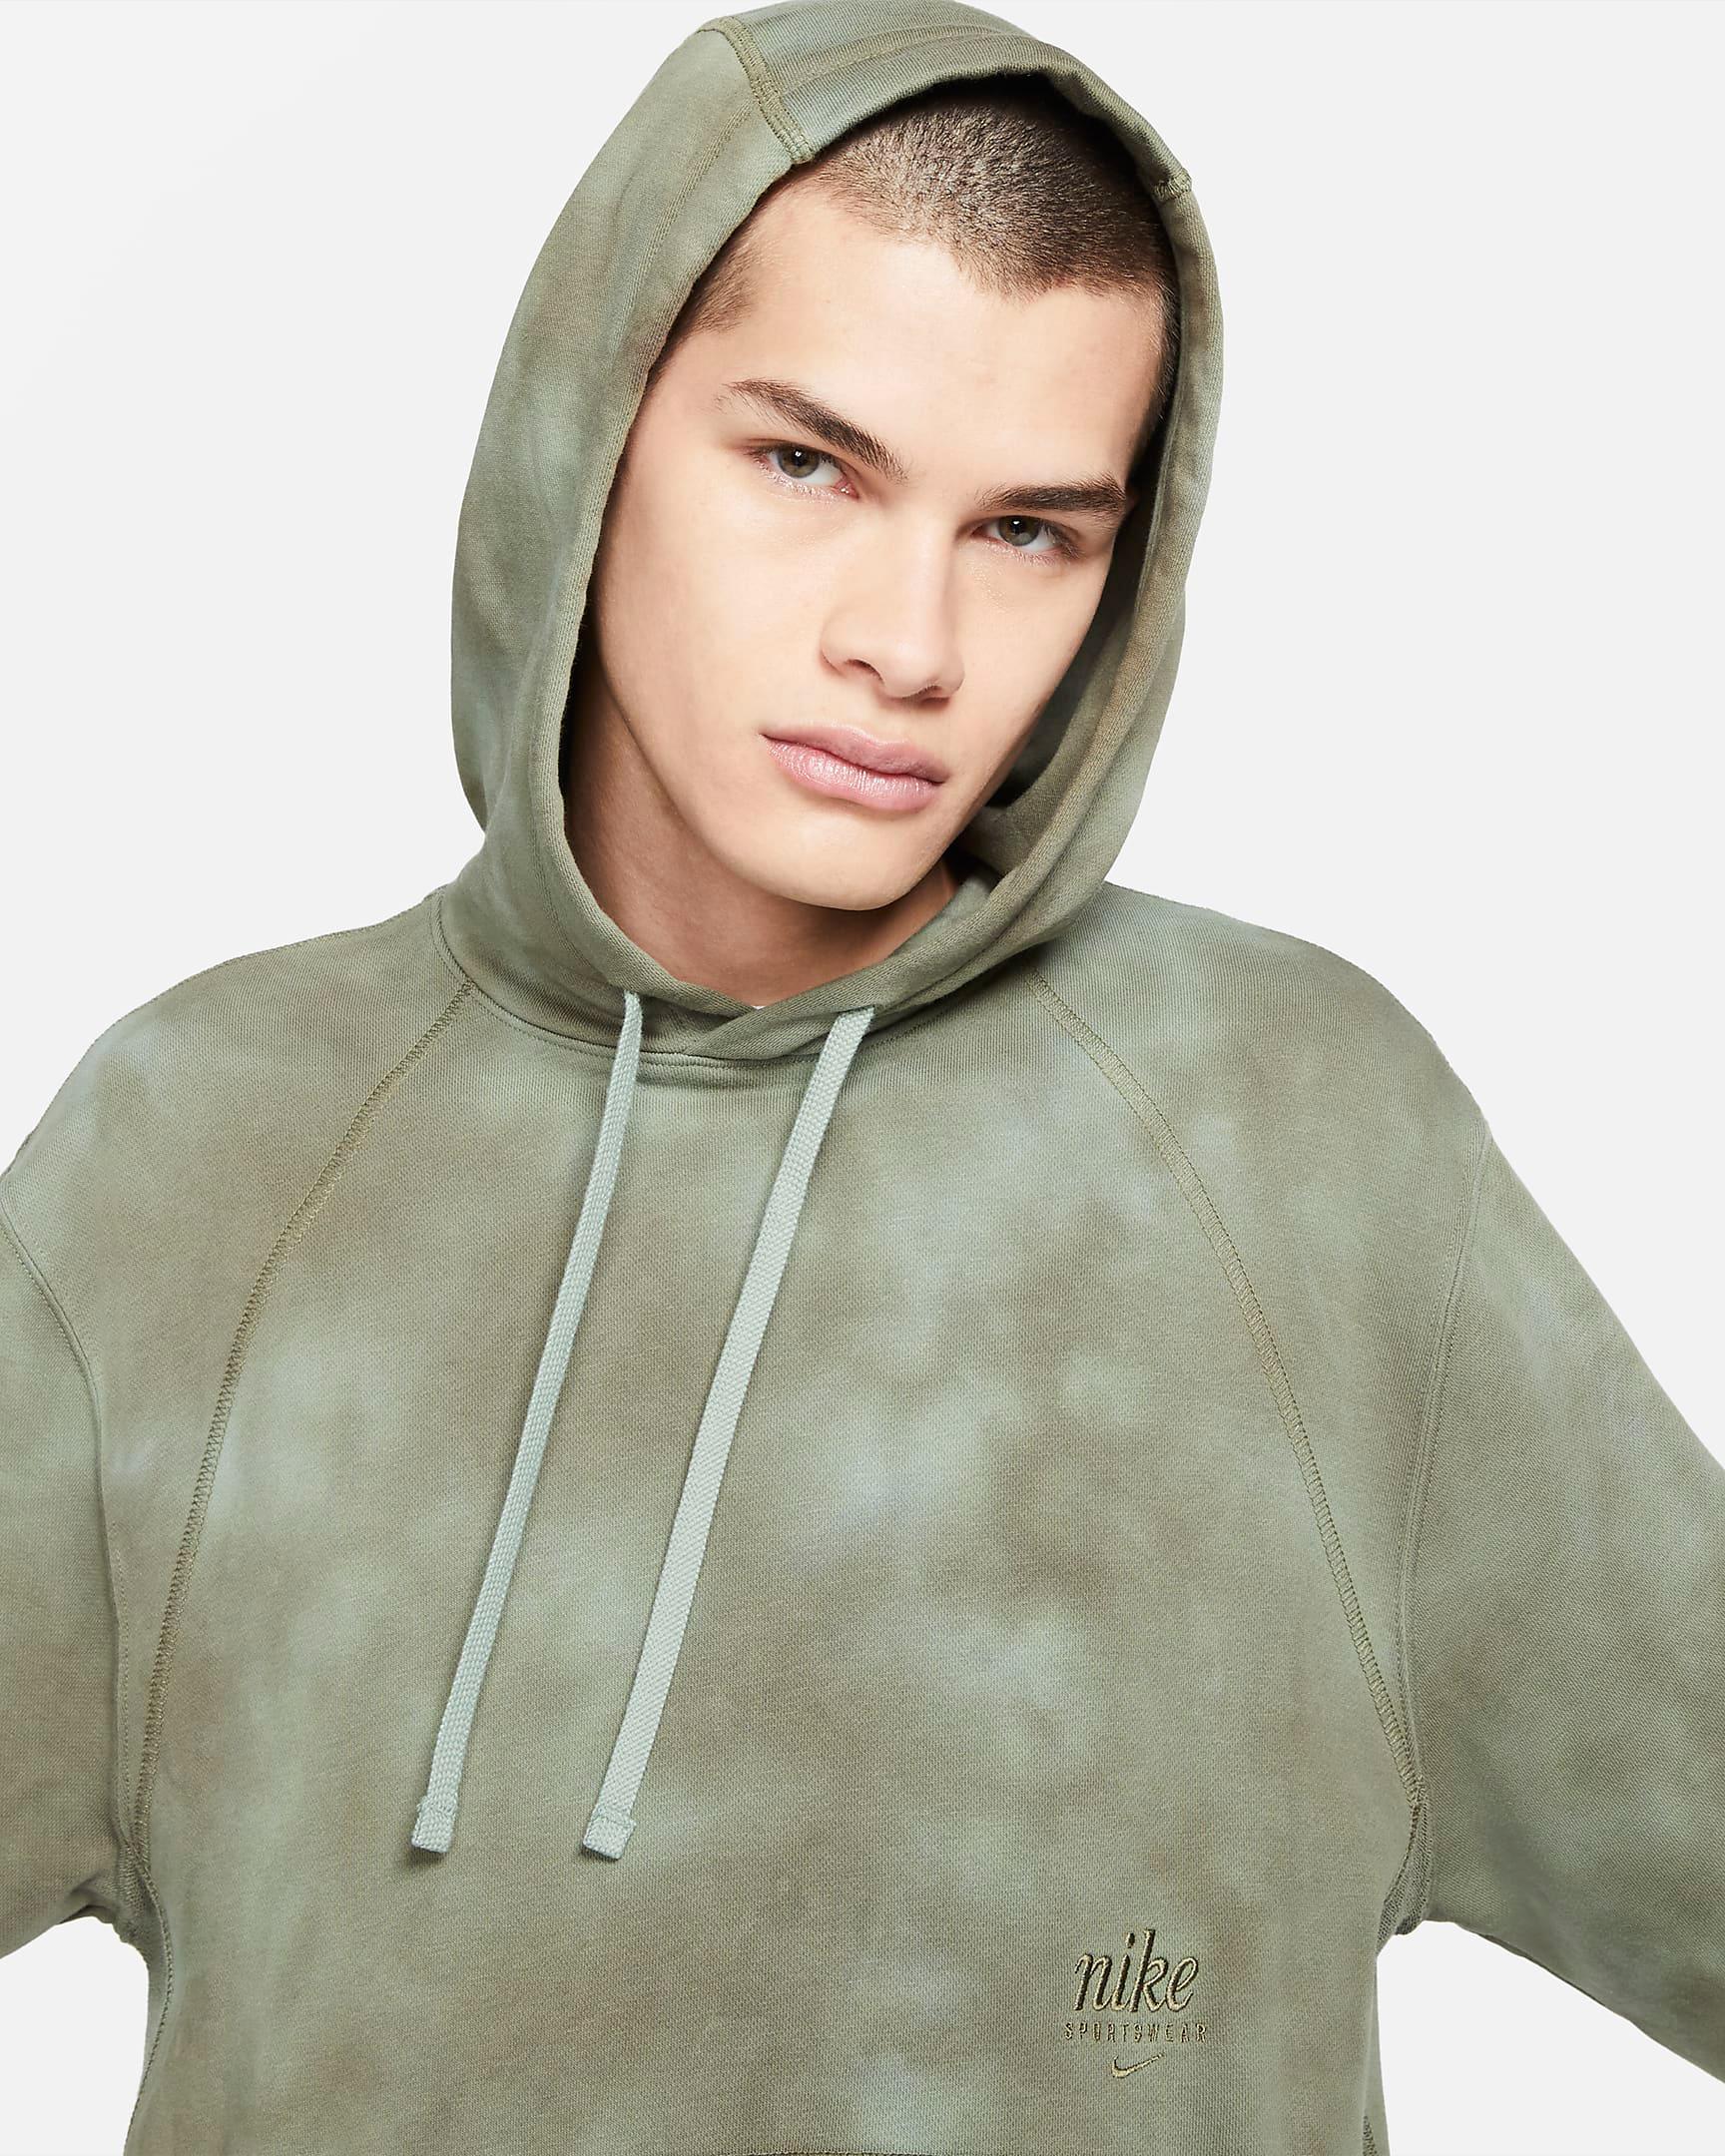 nike-club-fleece-tie-dye-hoodie-green-1